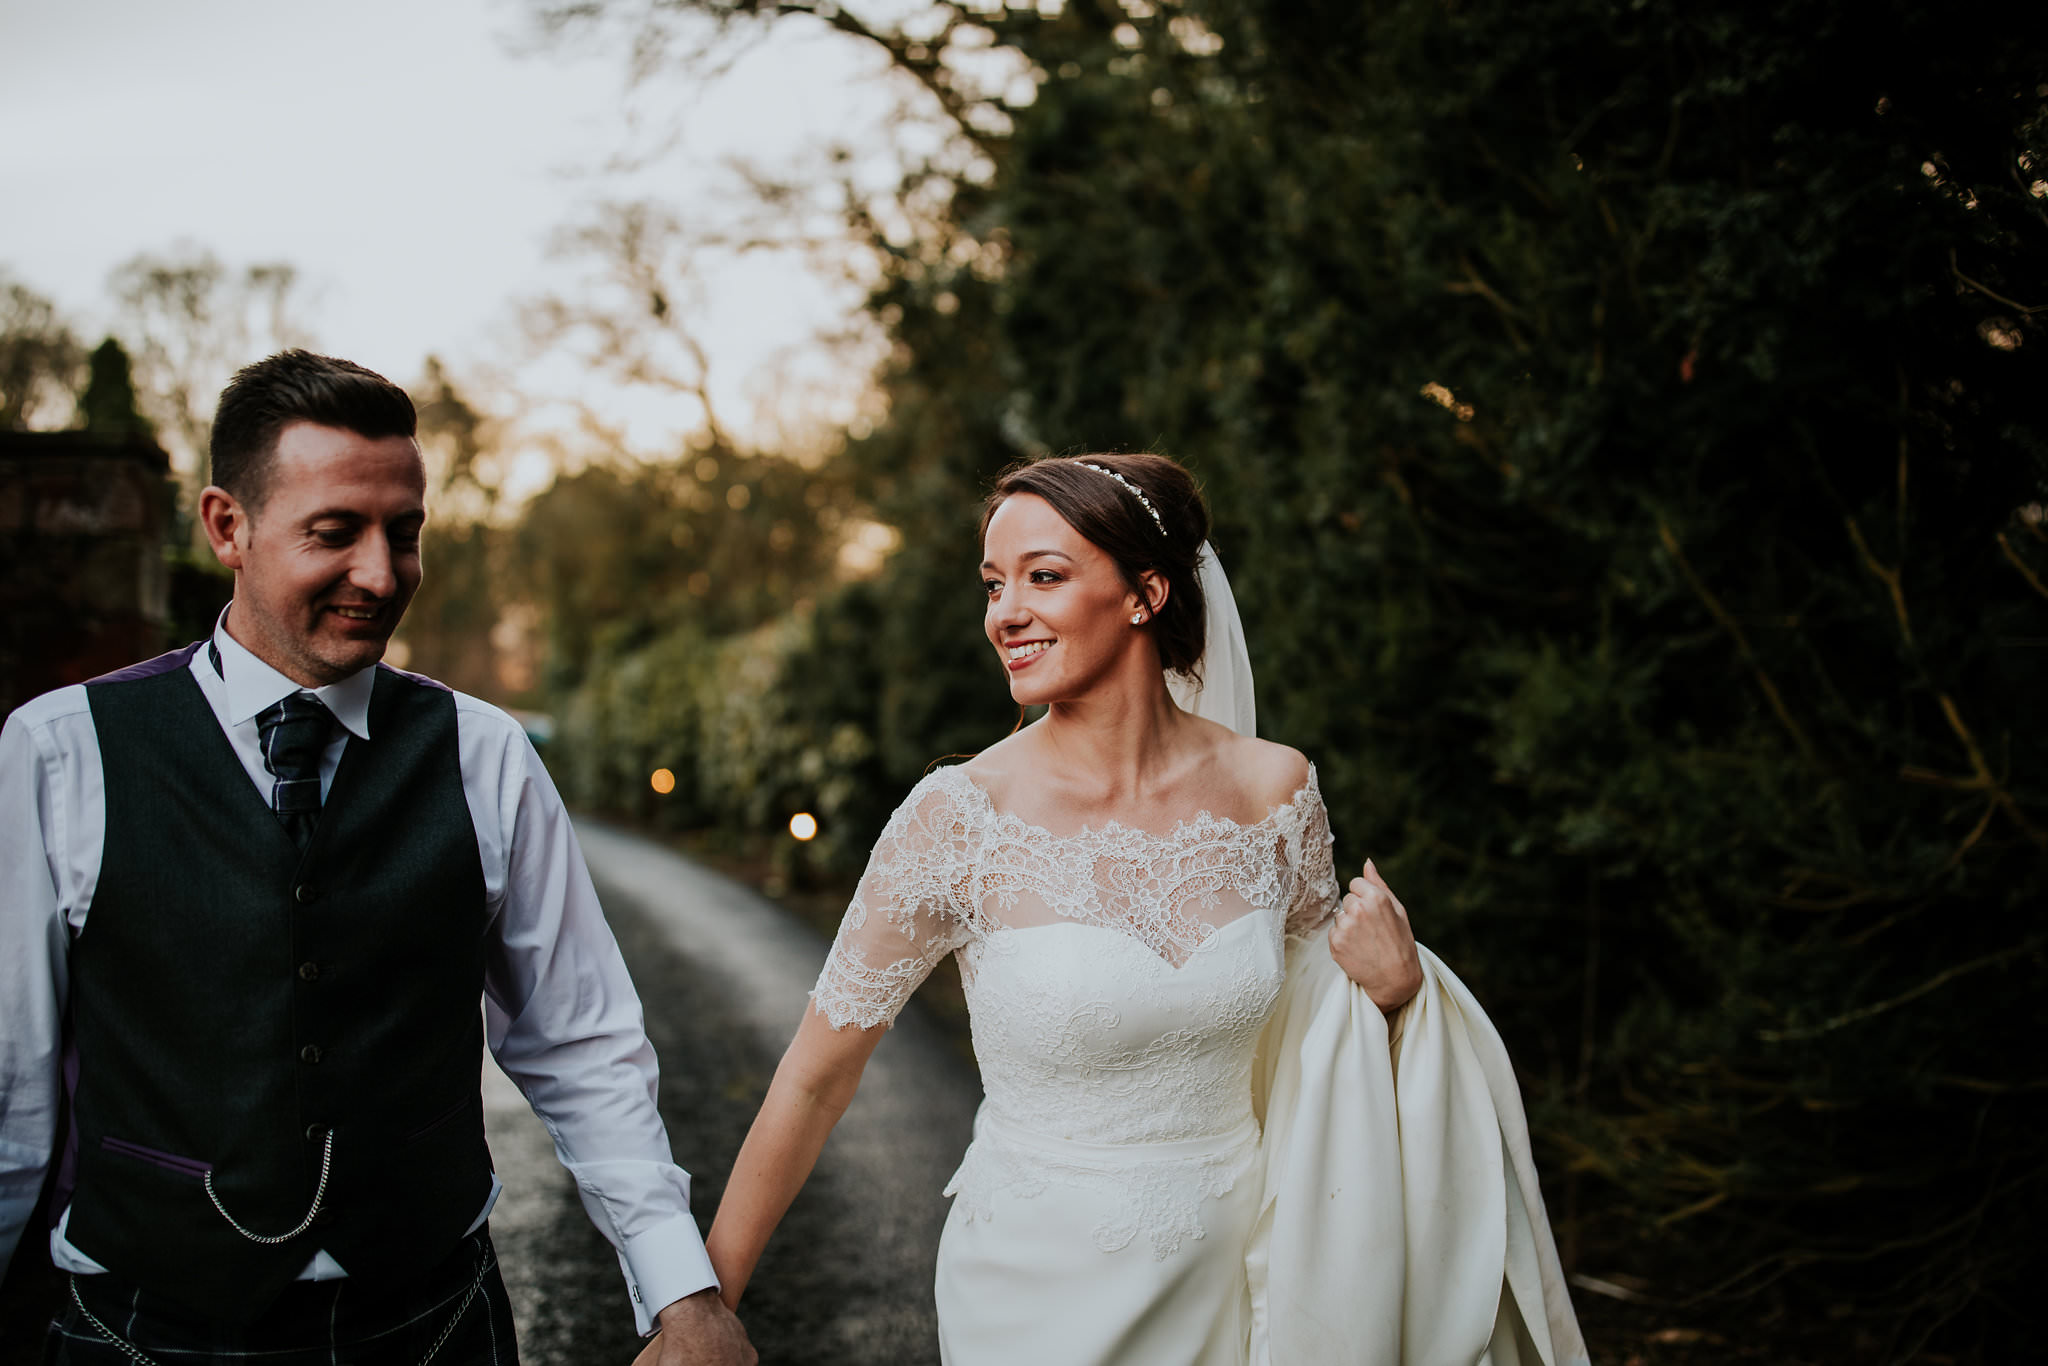 kirknewton stables wedding photographer (75).jpg